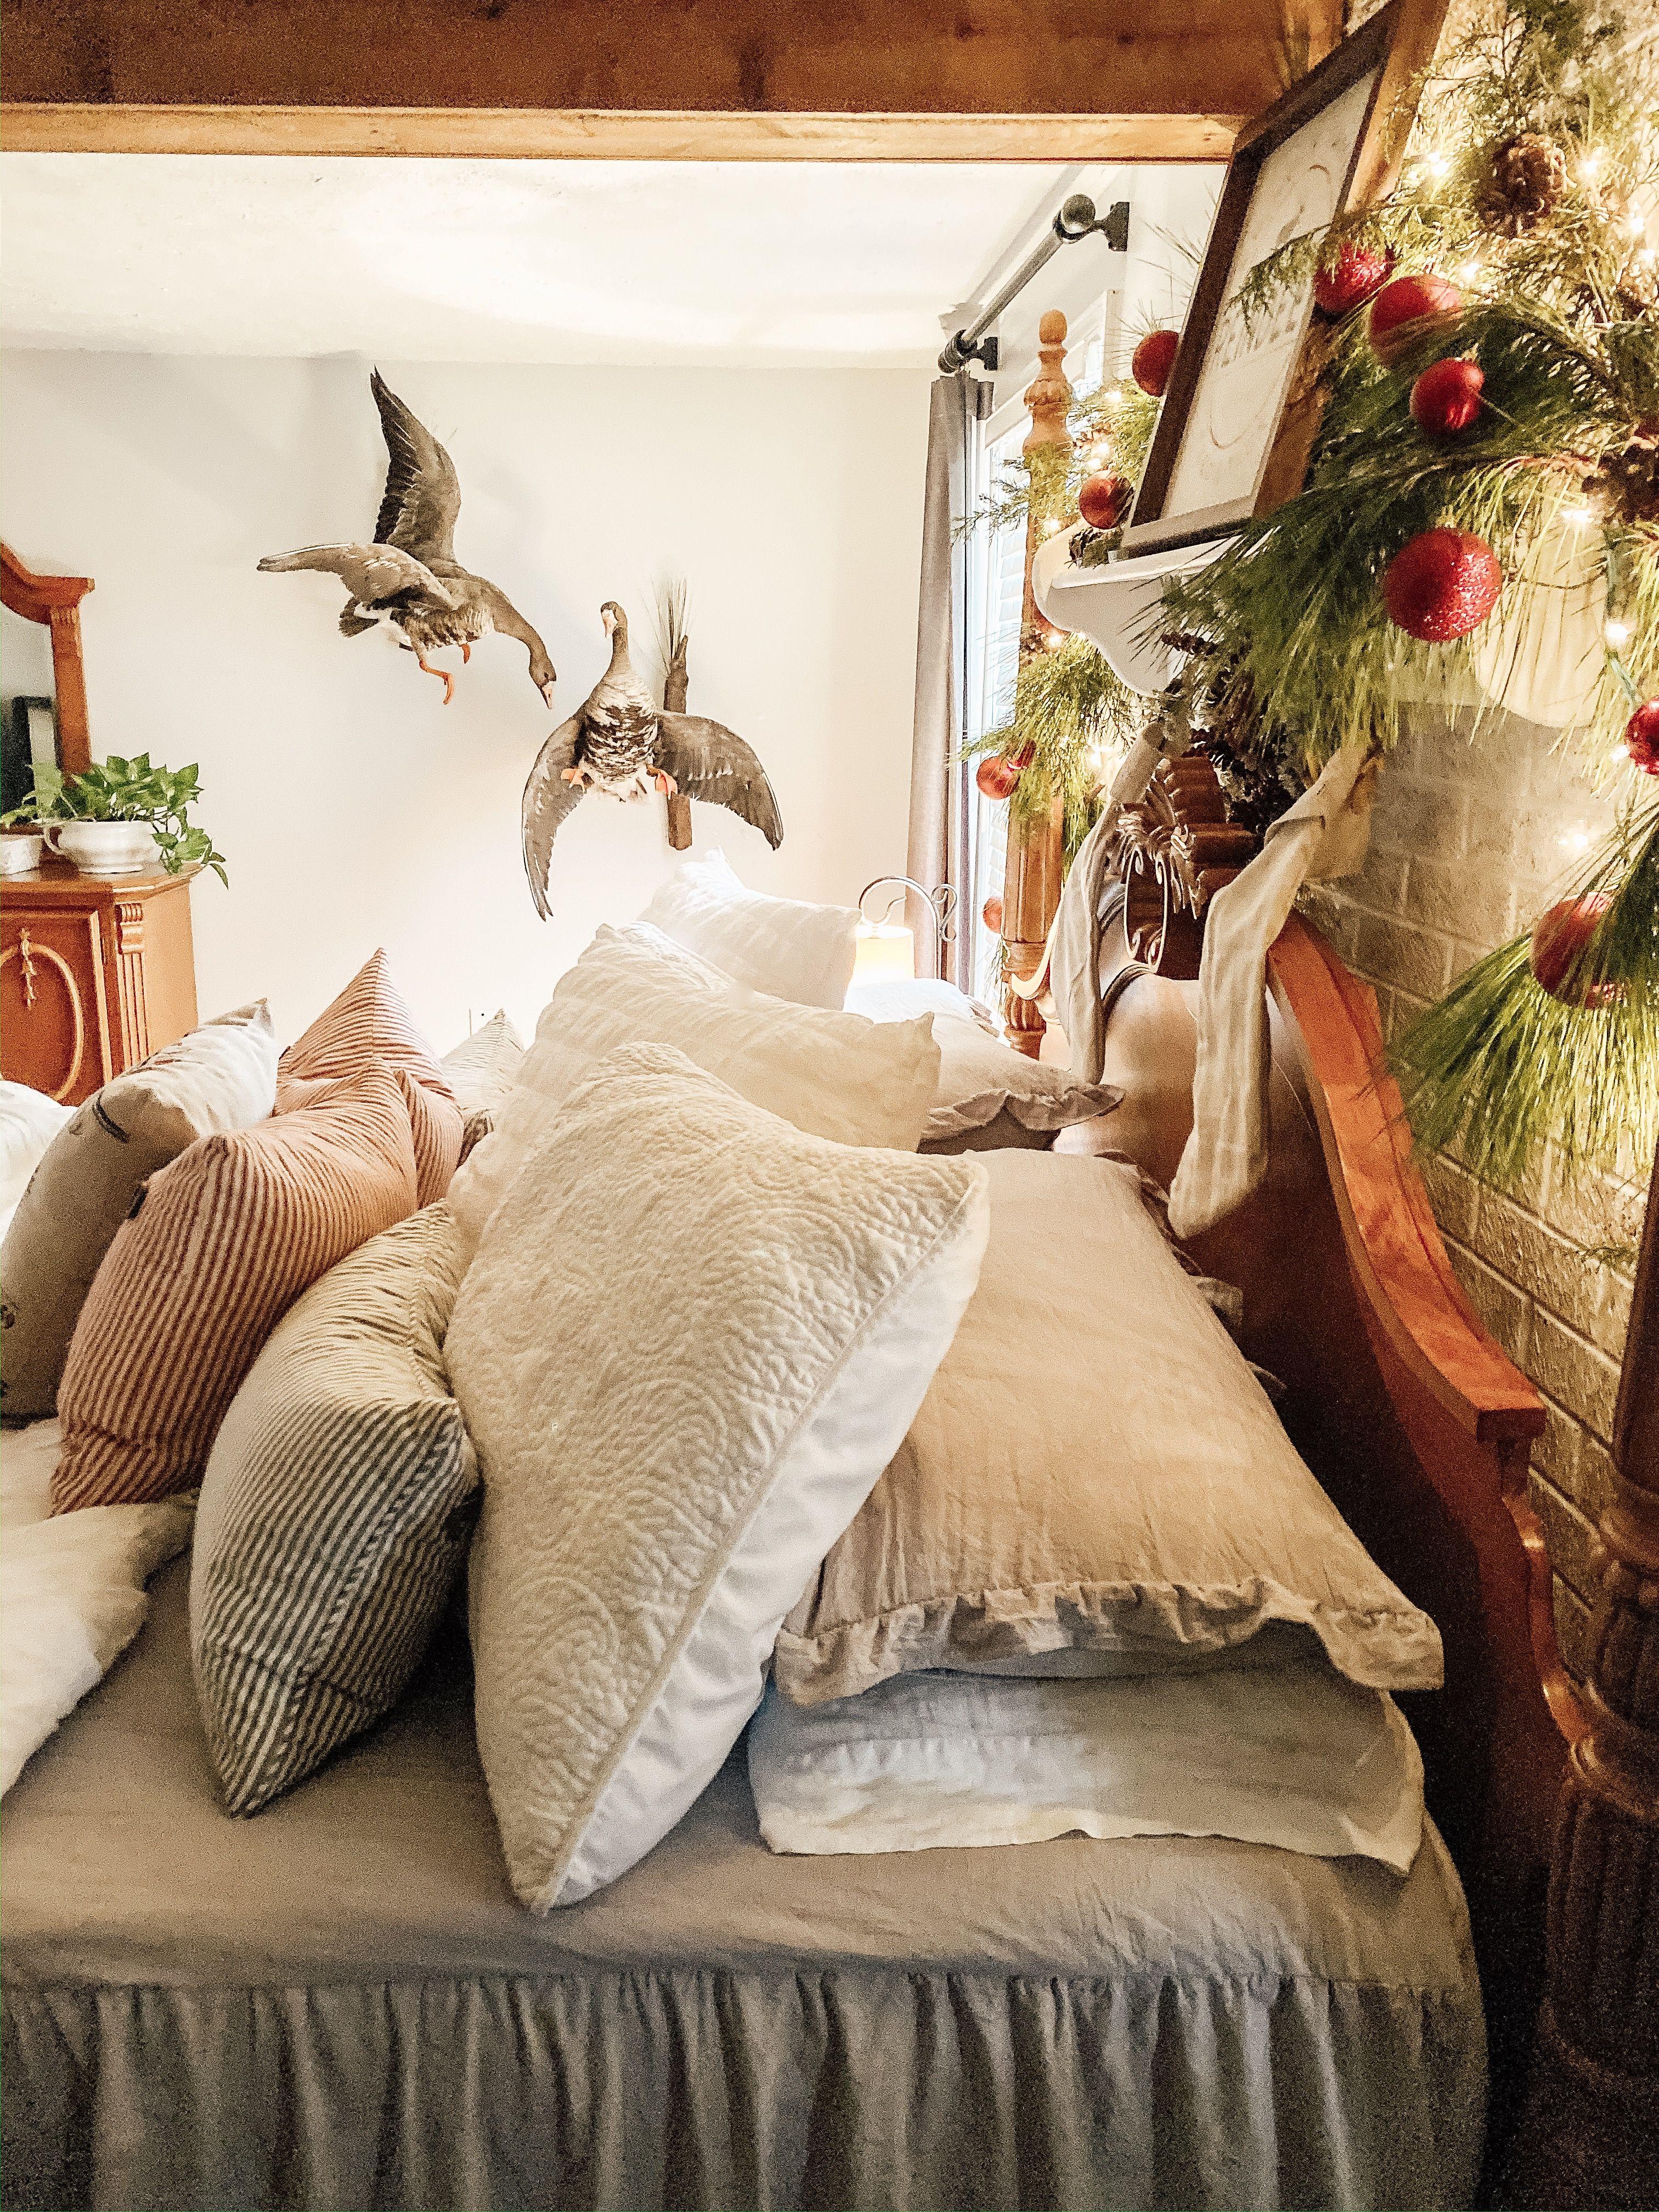 Farmhouse bedroom decor, ruffle bedspread, white duvet